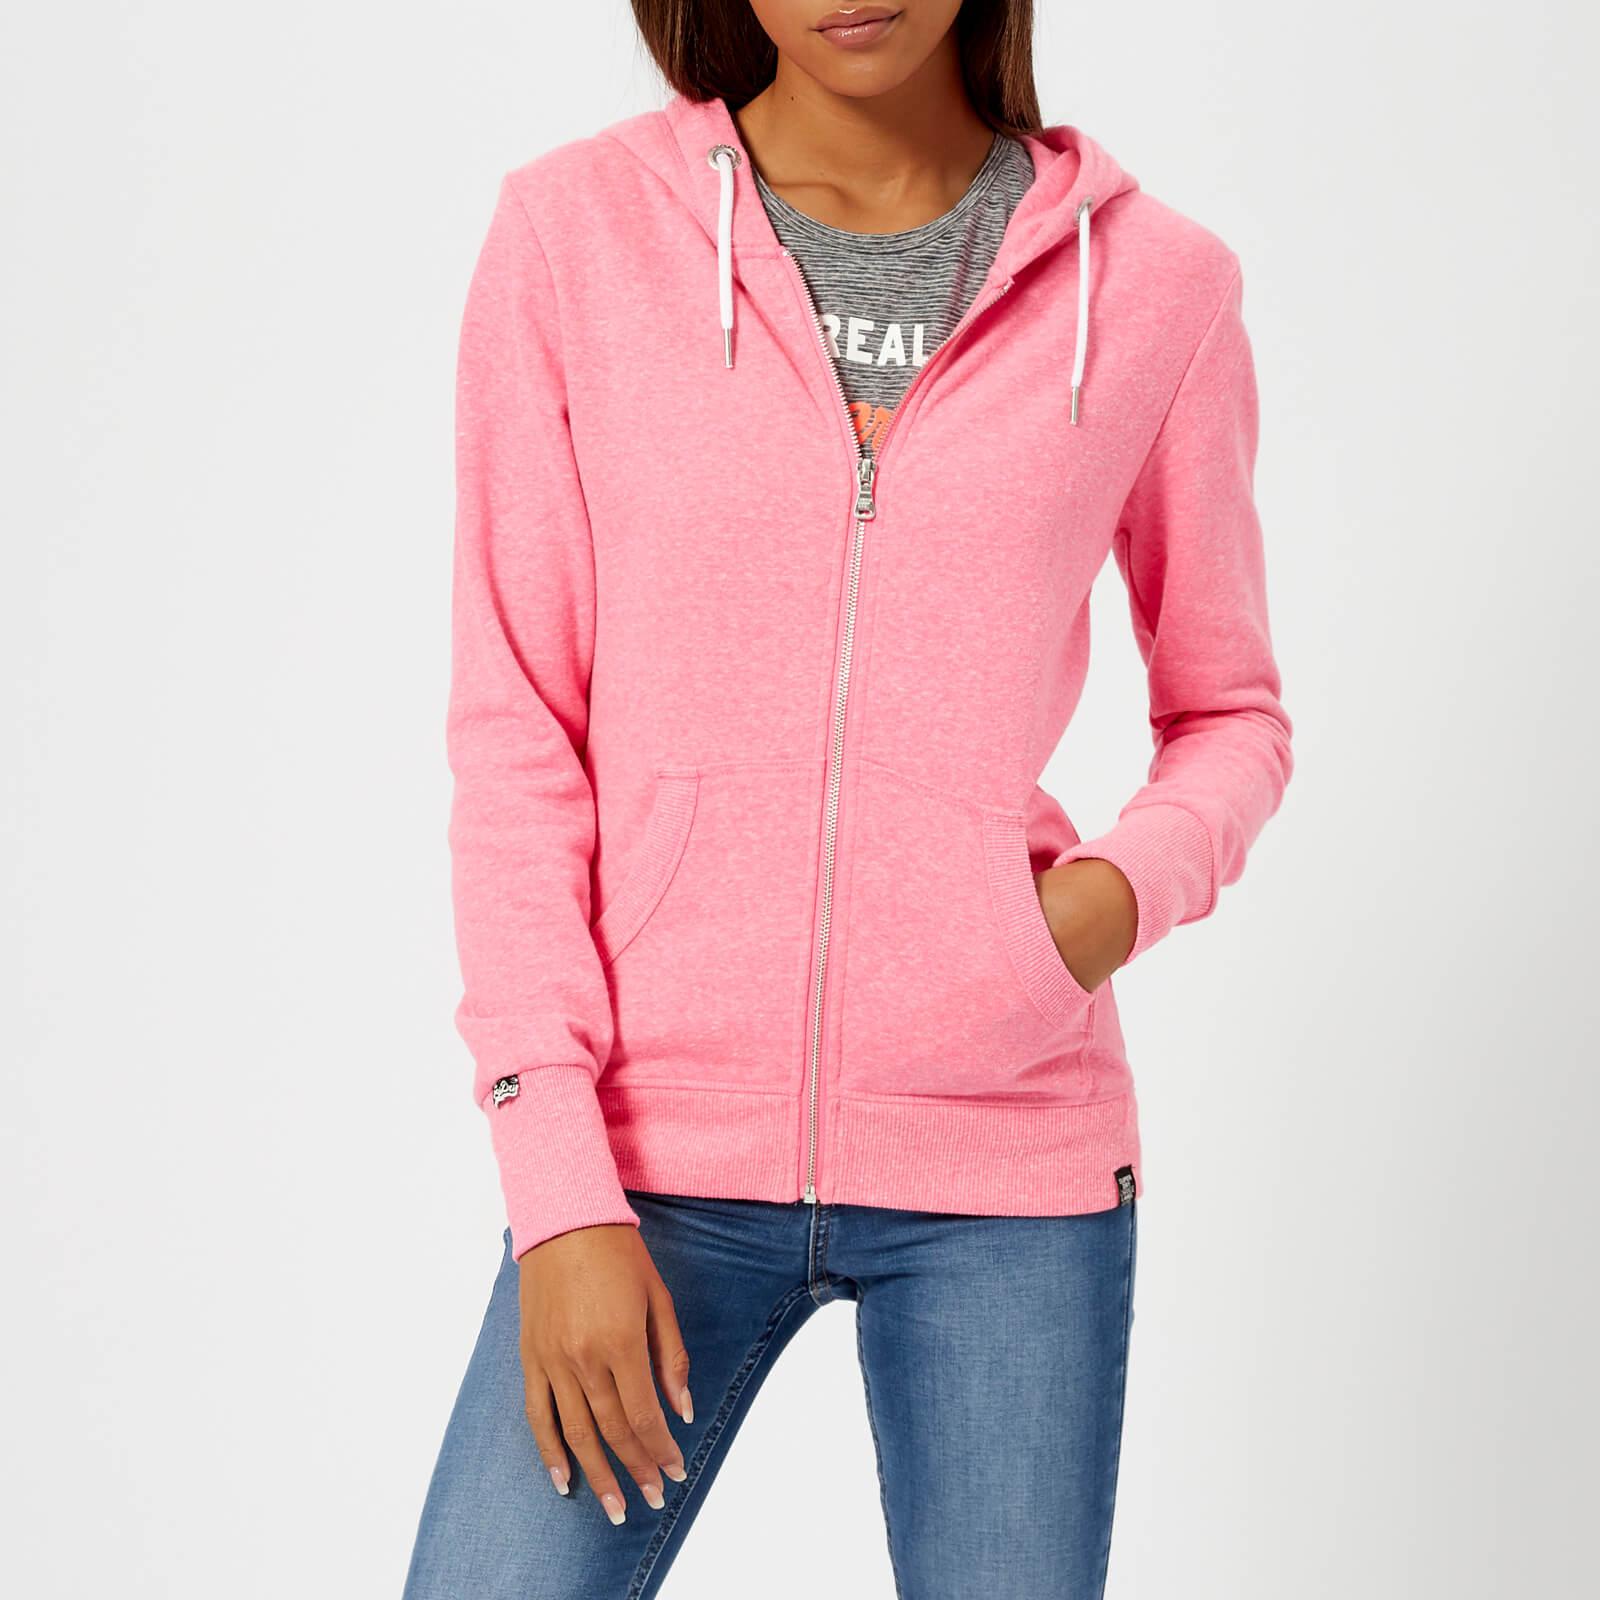 481a0deee3cb5 Superdry Women s Orange Label Luxe Loopback Zip Hoody - Blizzard Pink Snowy  Womens Clothing